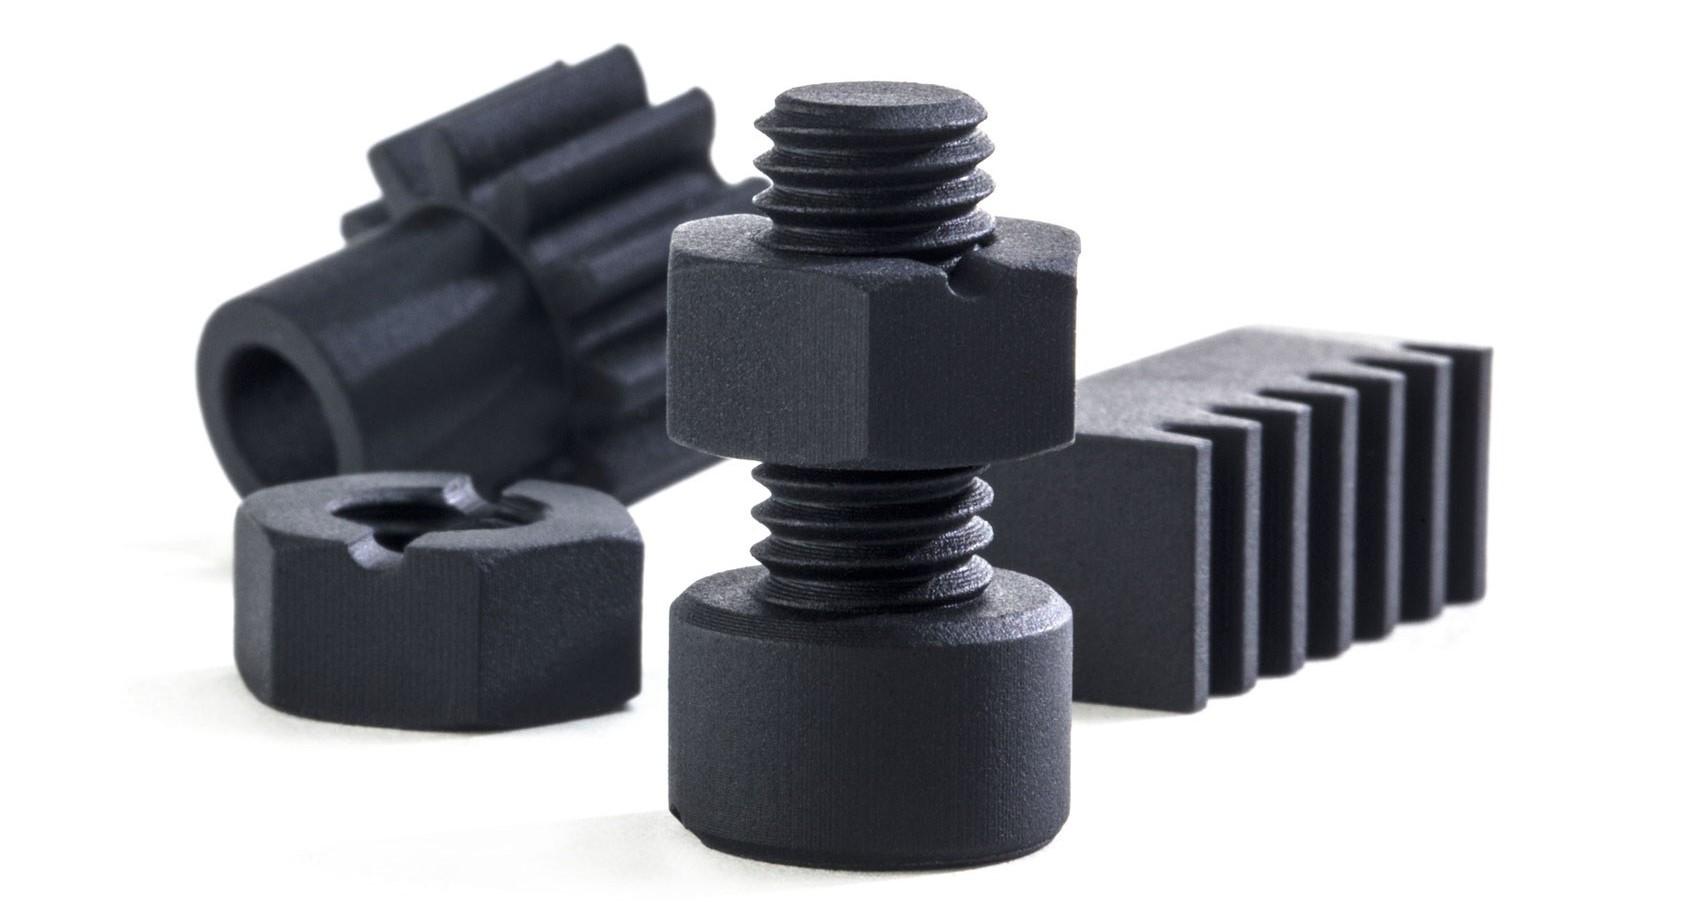 Industrial grade 3D printed parts. Photo via Fast Radius